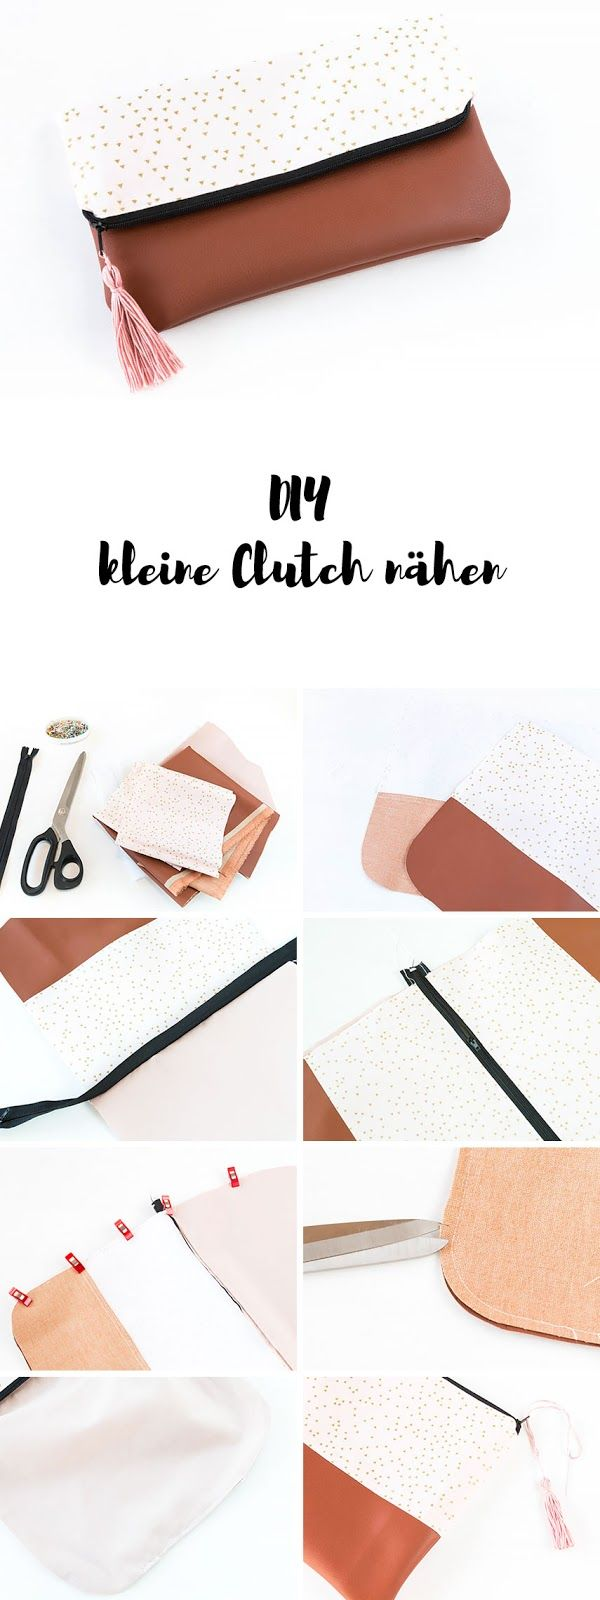 Photo of Nähen DIY Clutch Make Up Bag – DIY Geschenk | ars textura – DIY Blog